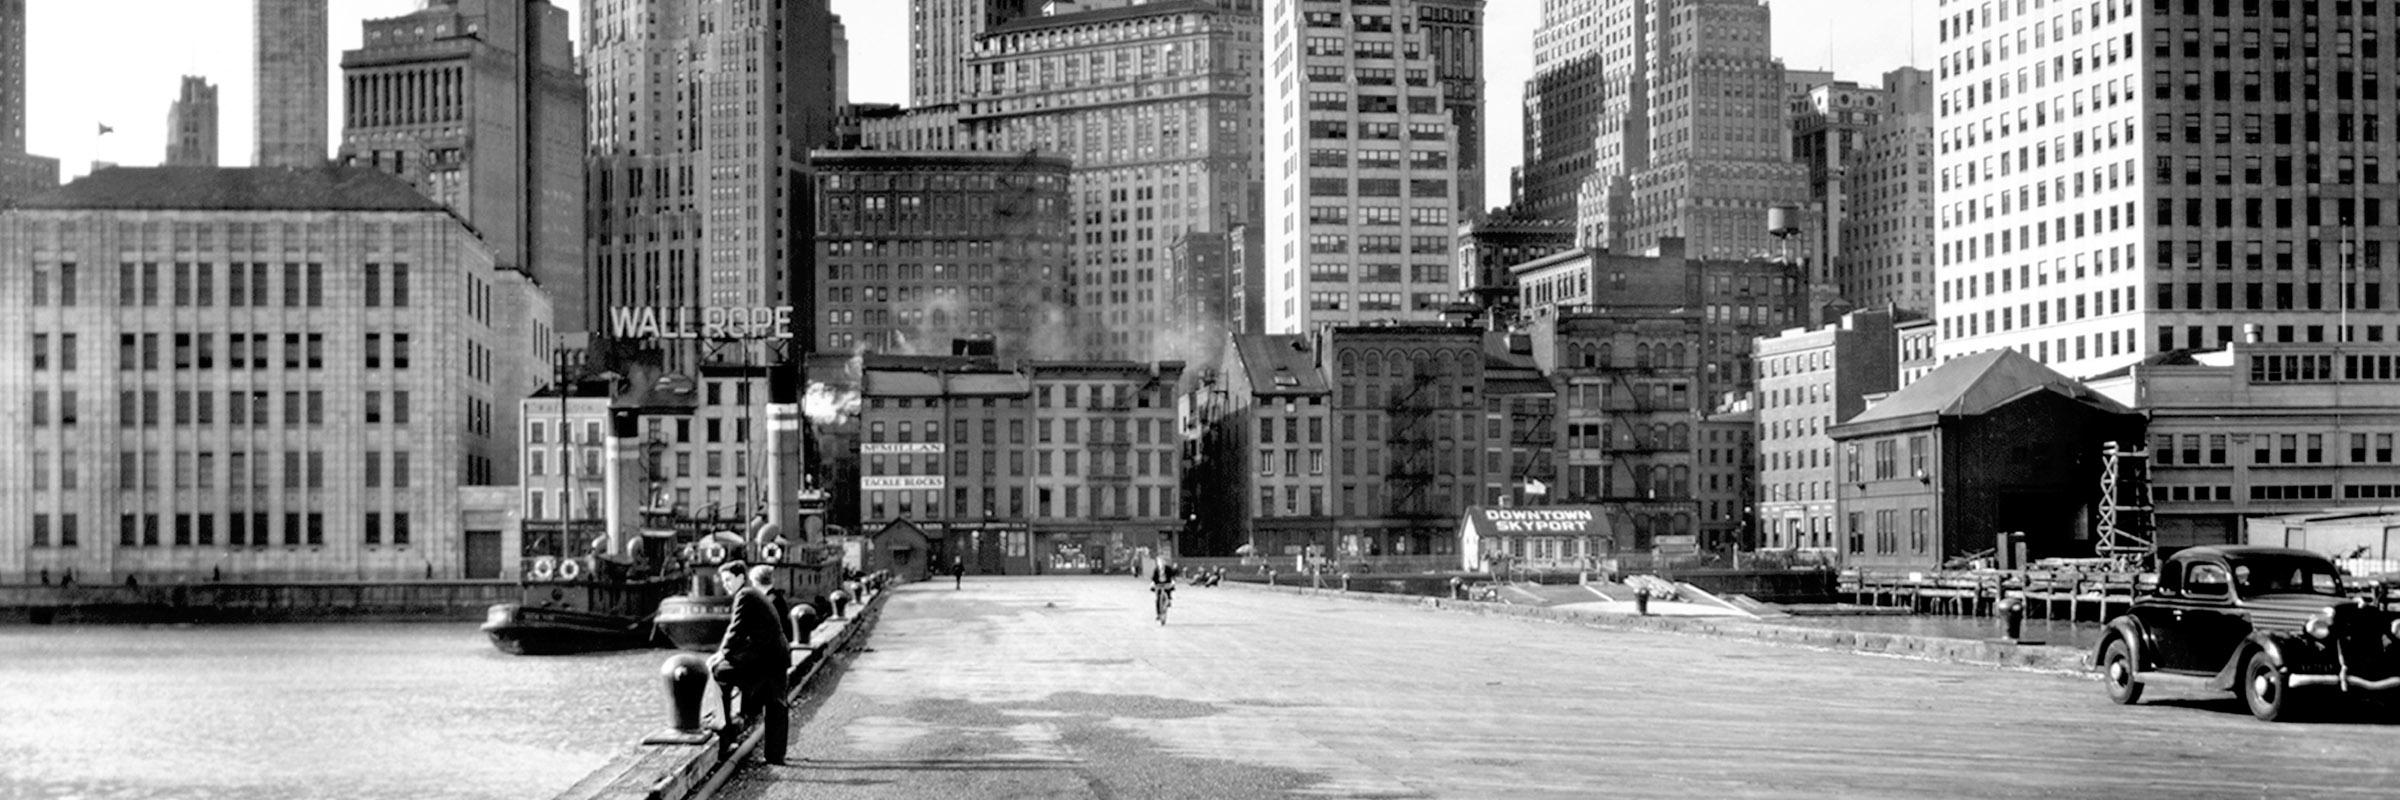 NYC_A.jpg